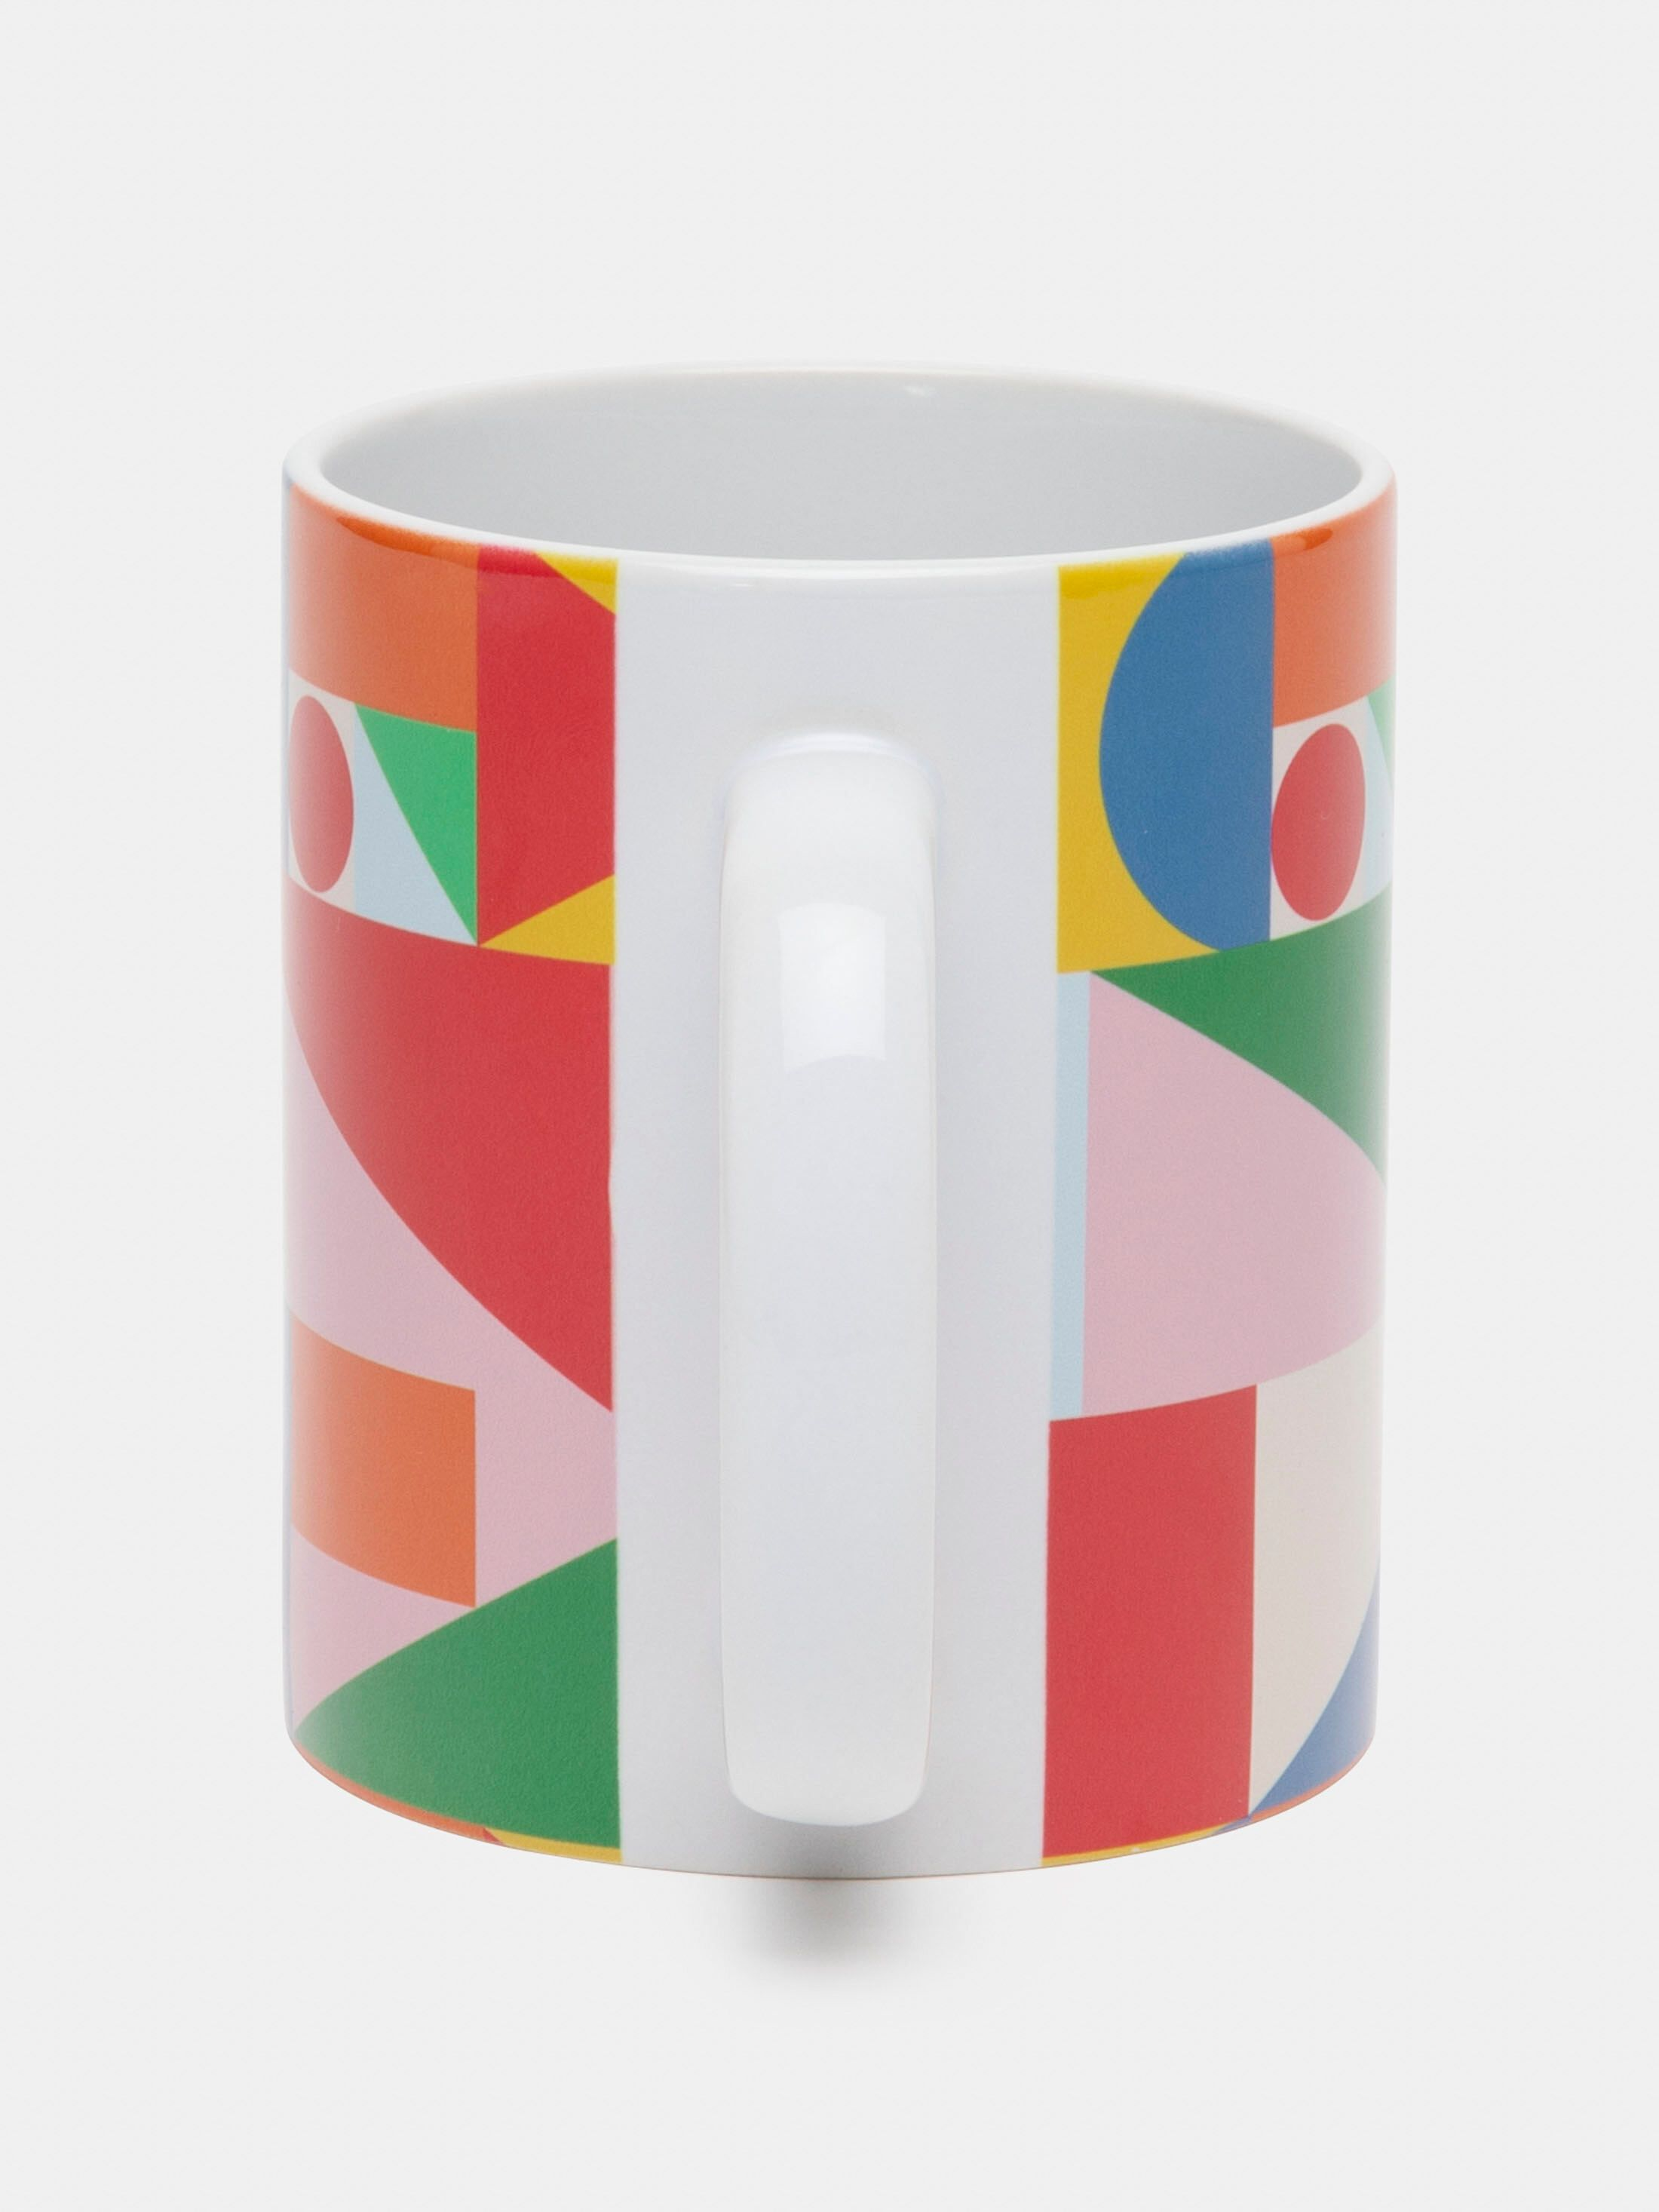 Make Your Own Mug Design for Home or Brand